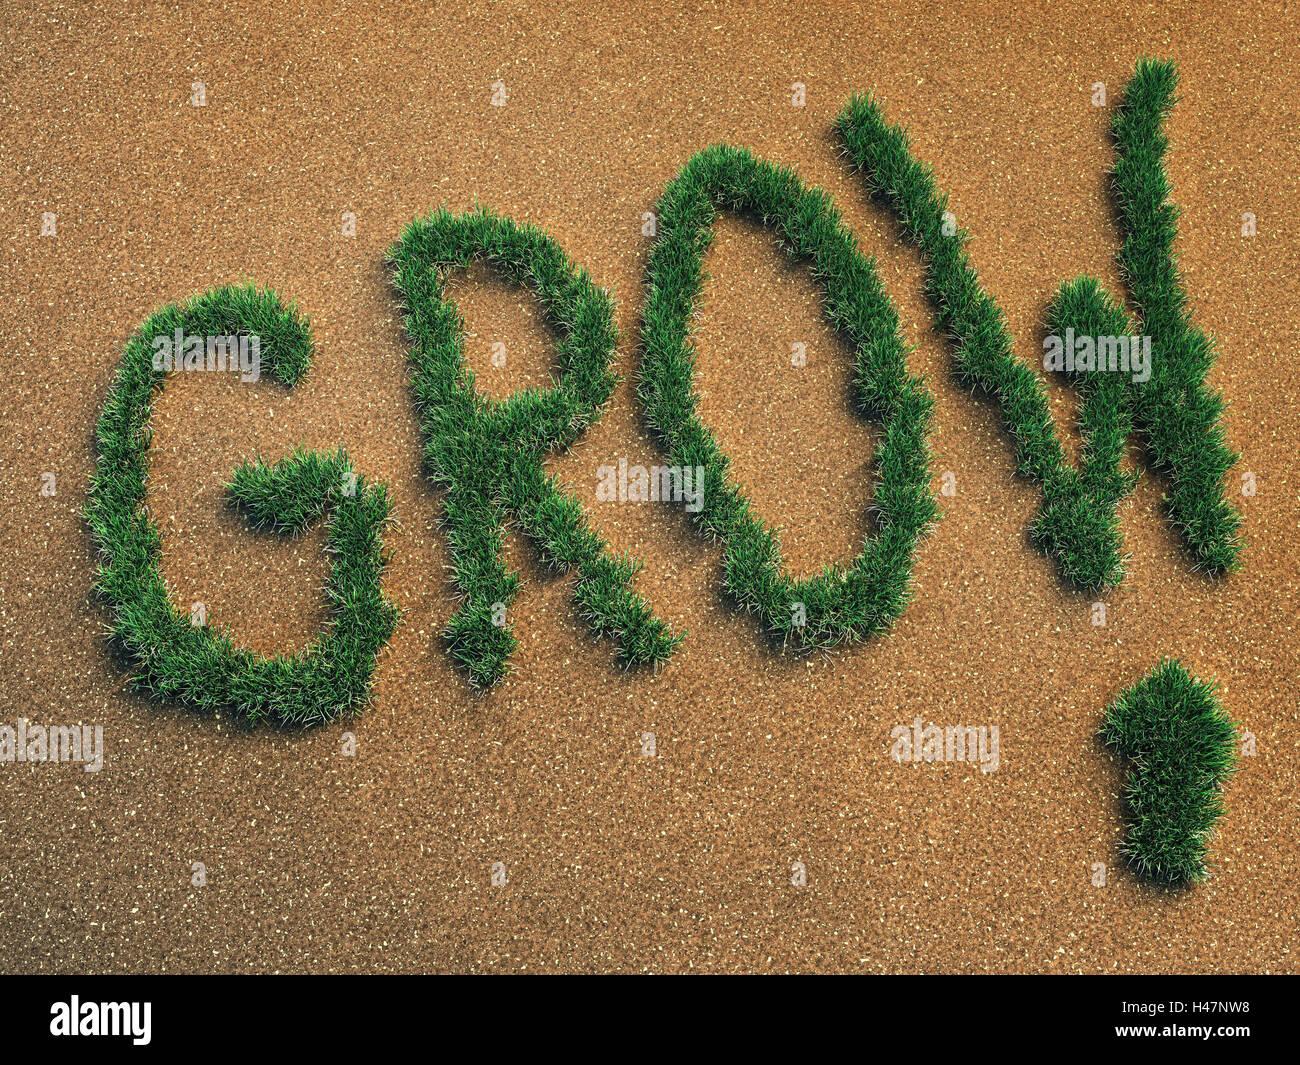 Computer graphics, sandy soil, GROW, economic growth, grass, growth, grow, icon, Sand, upward, promotion, increase, - Stock Image